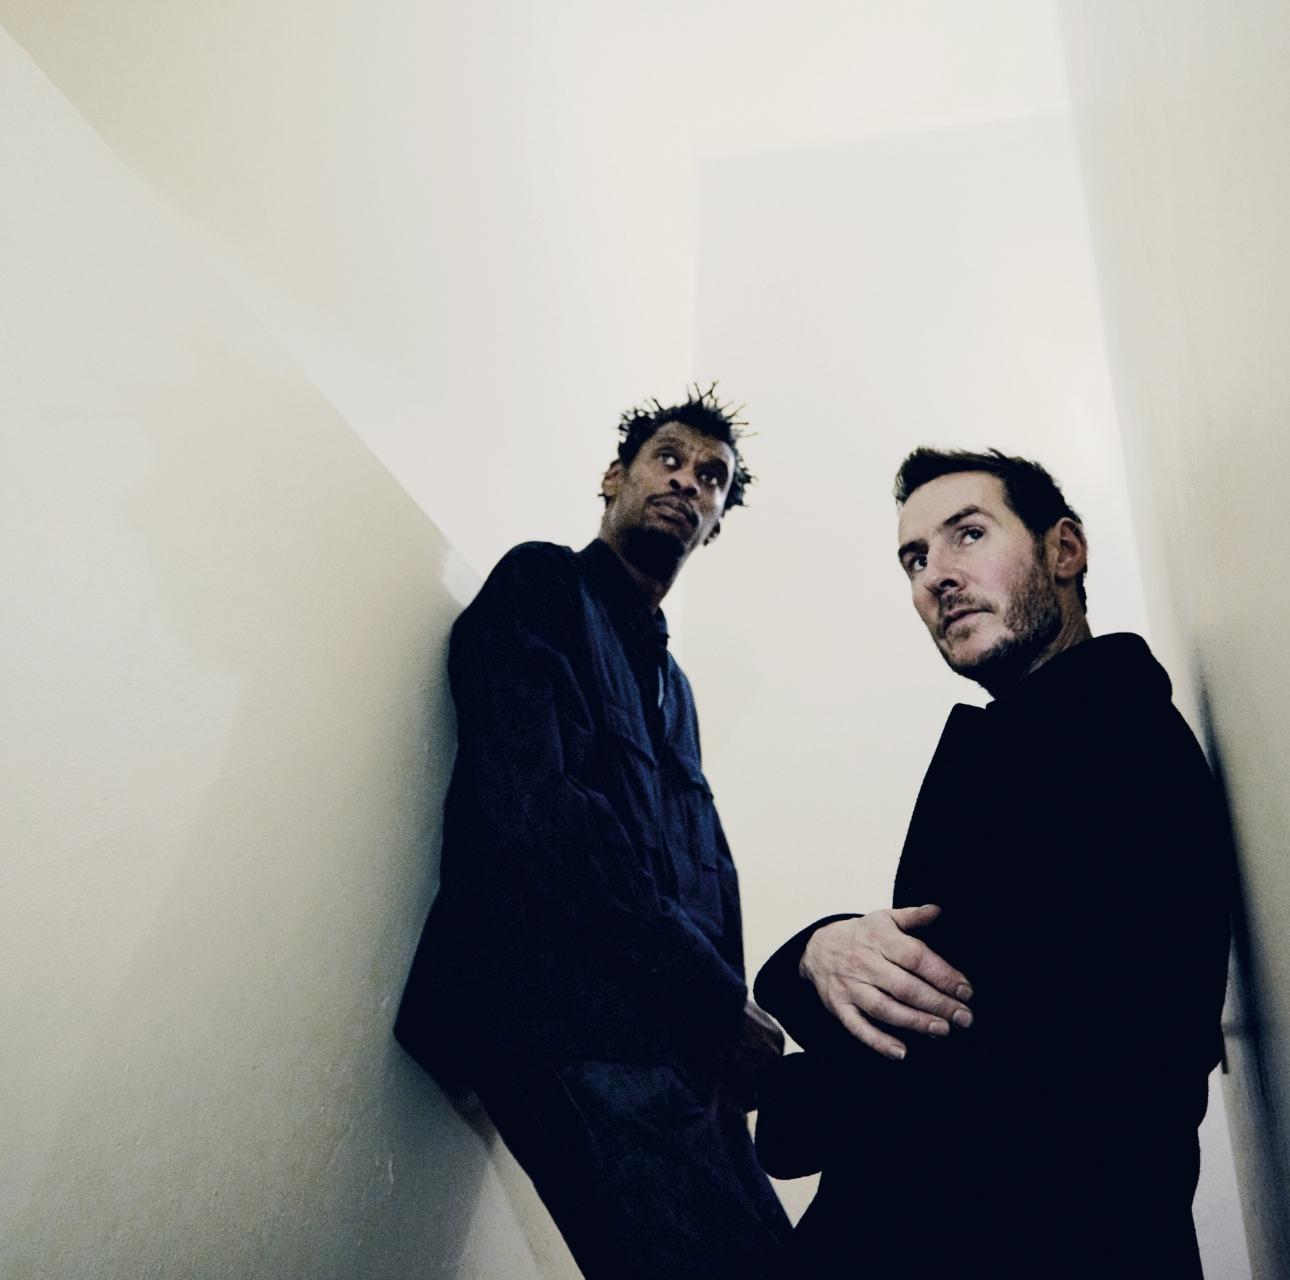 NEWS: Massive Attack reveal three new songs via their 'Fantom' app